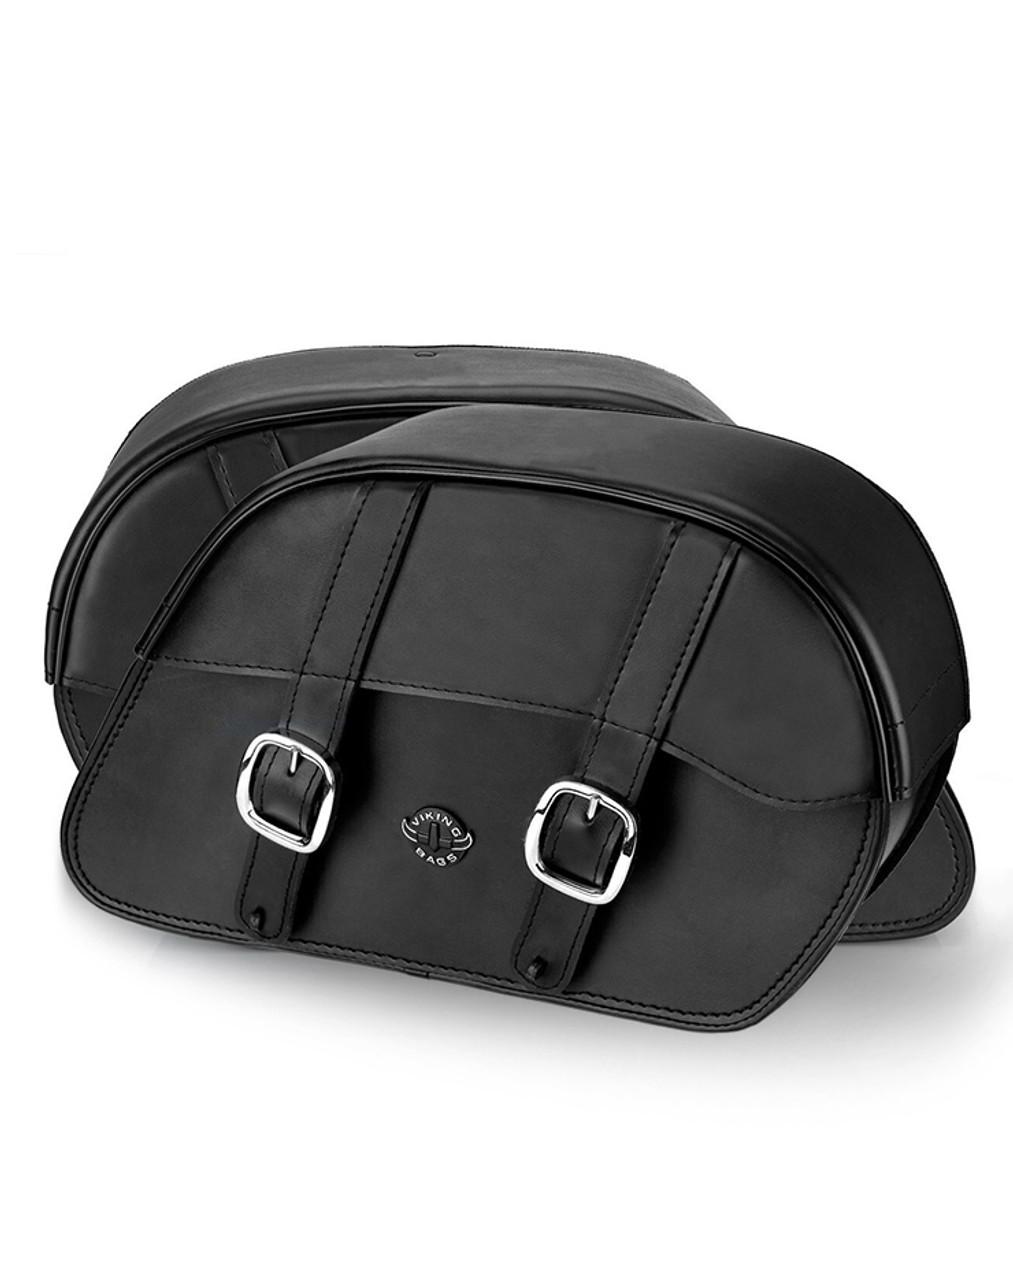 Victory Judge Medium Slanted Motorcycle Saddlebags Both Bags View